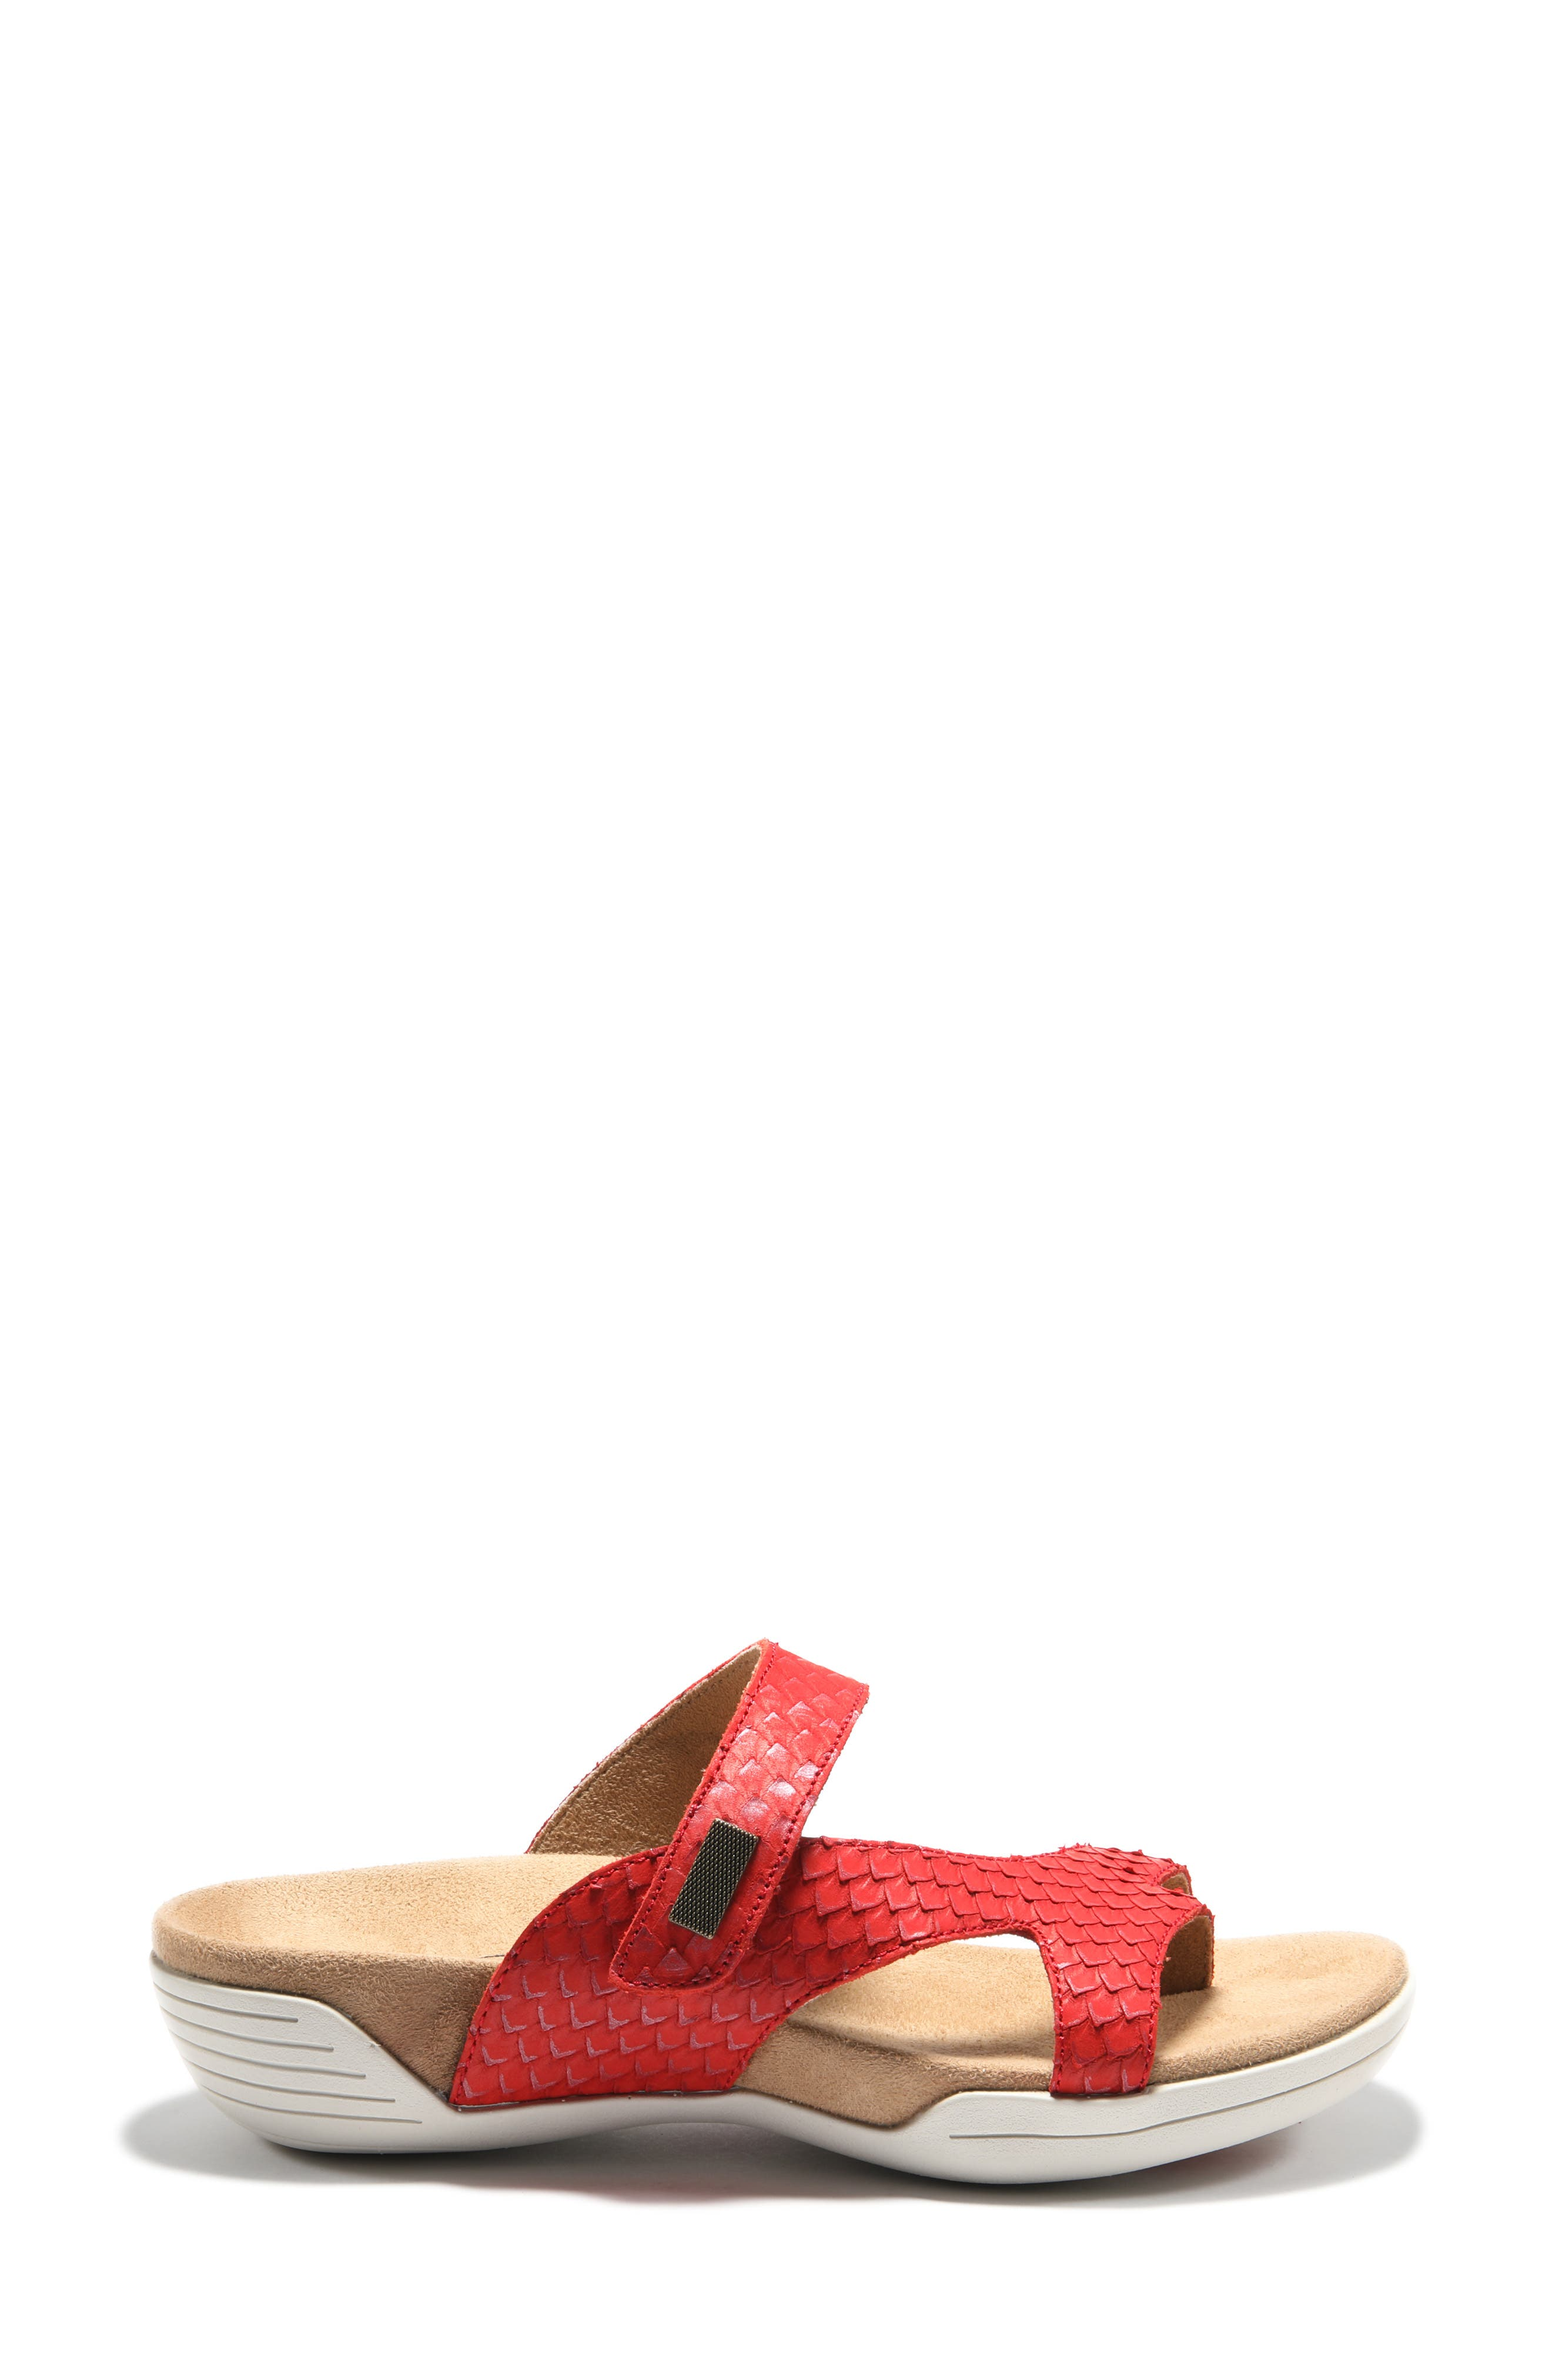 Women's Halsa Darline Asymmetrical Slide Sandal